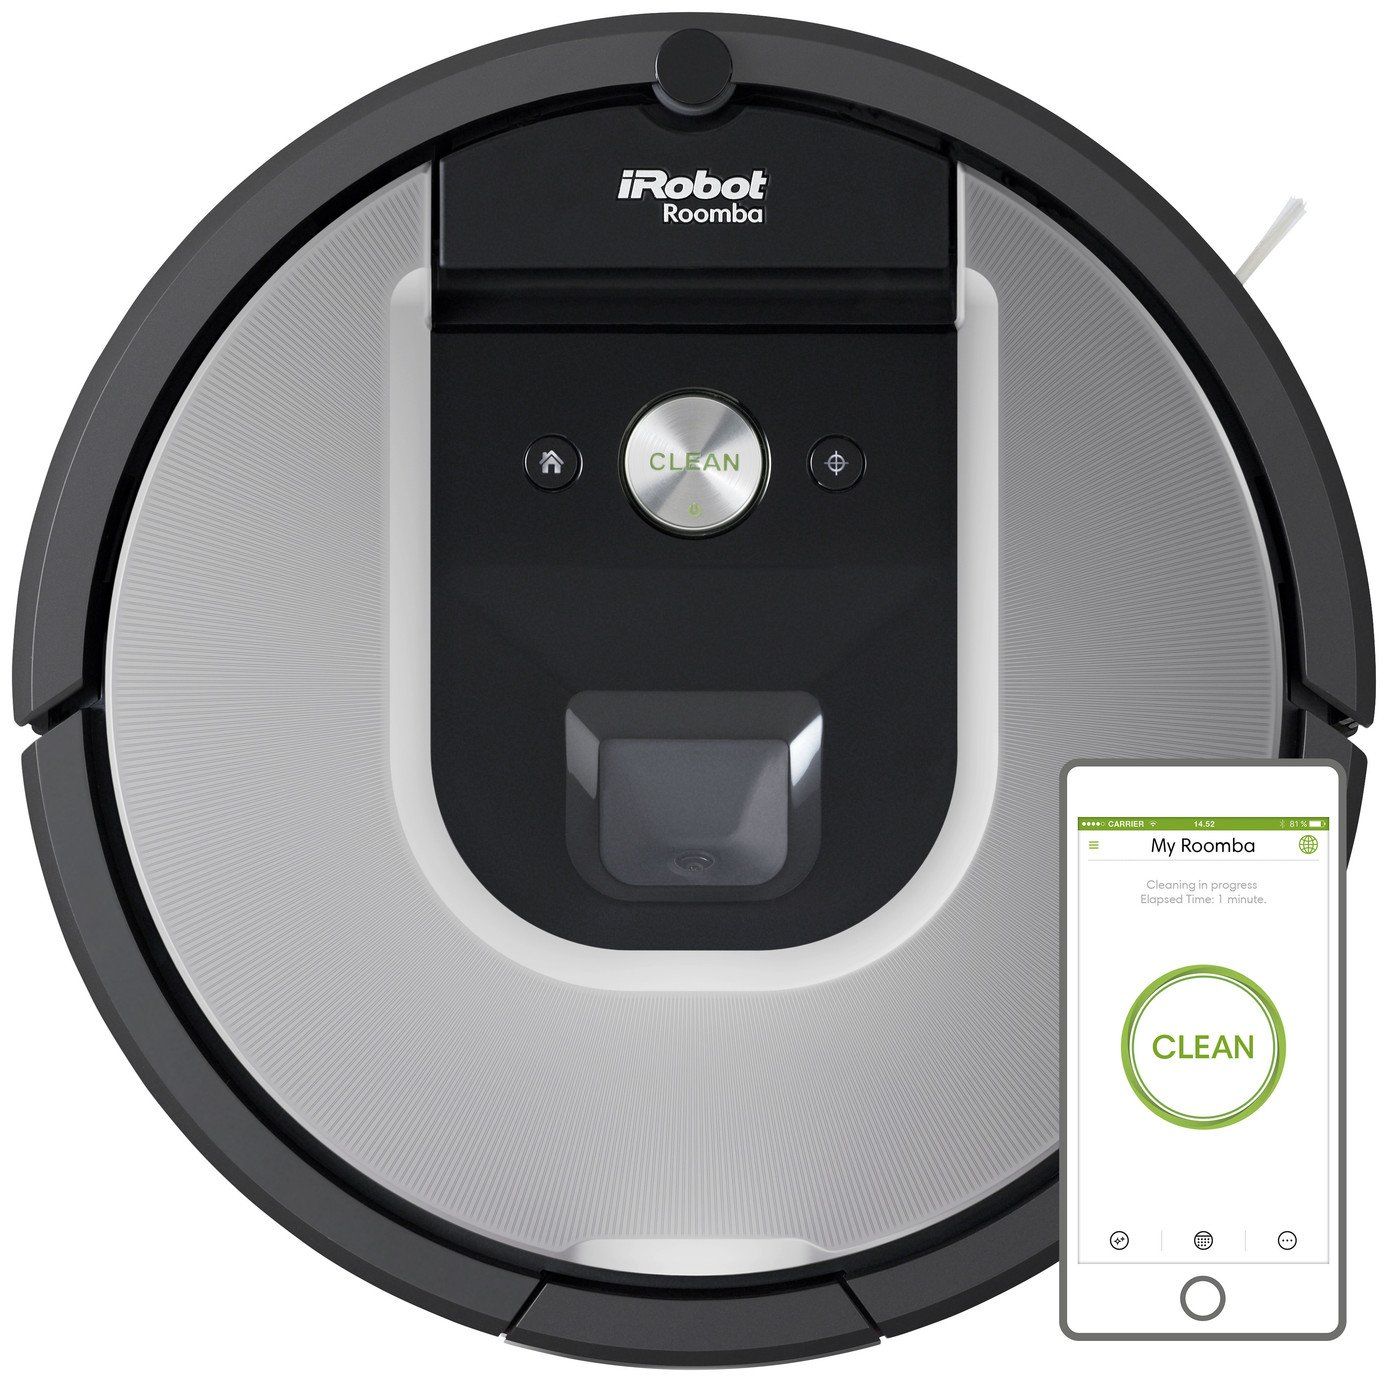 IRobot 965 Roomba Robot Vacuum Cleaner